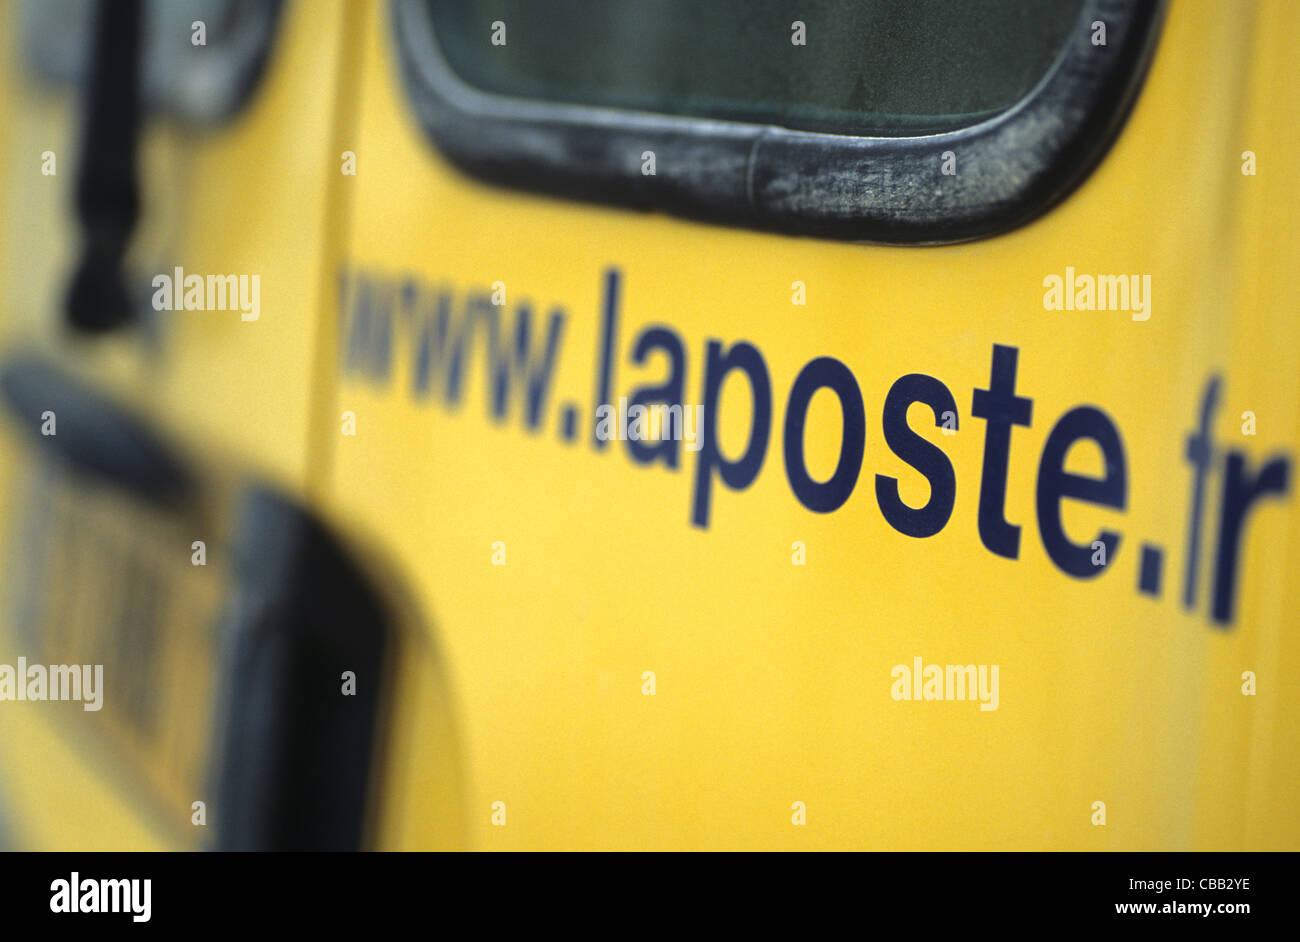 Mail van, France - Stock Image